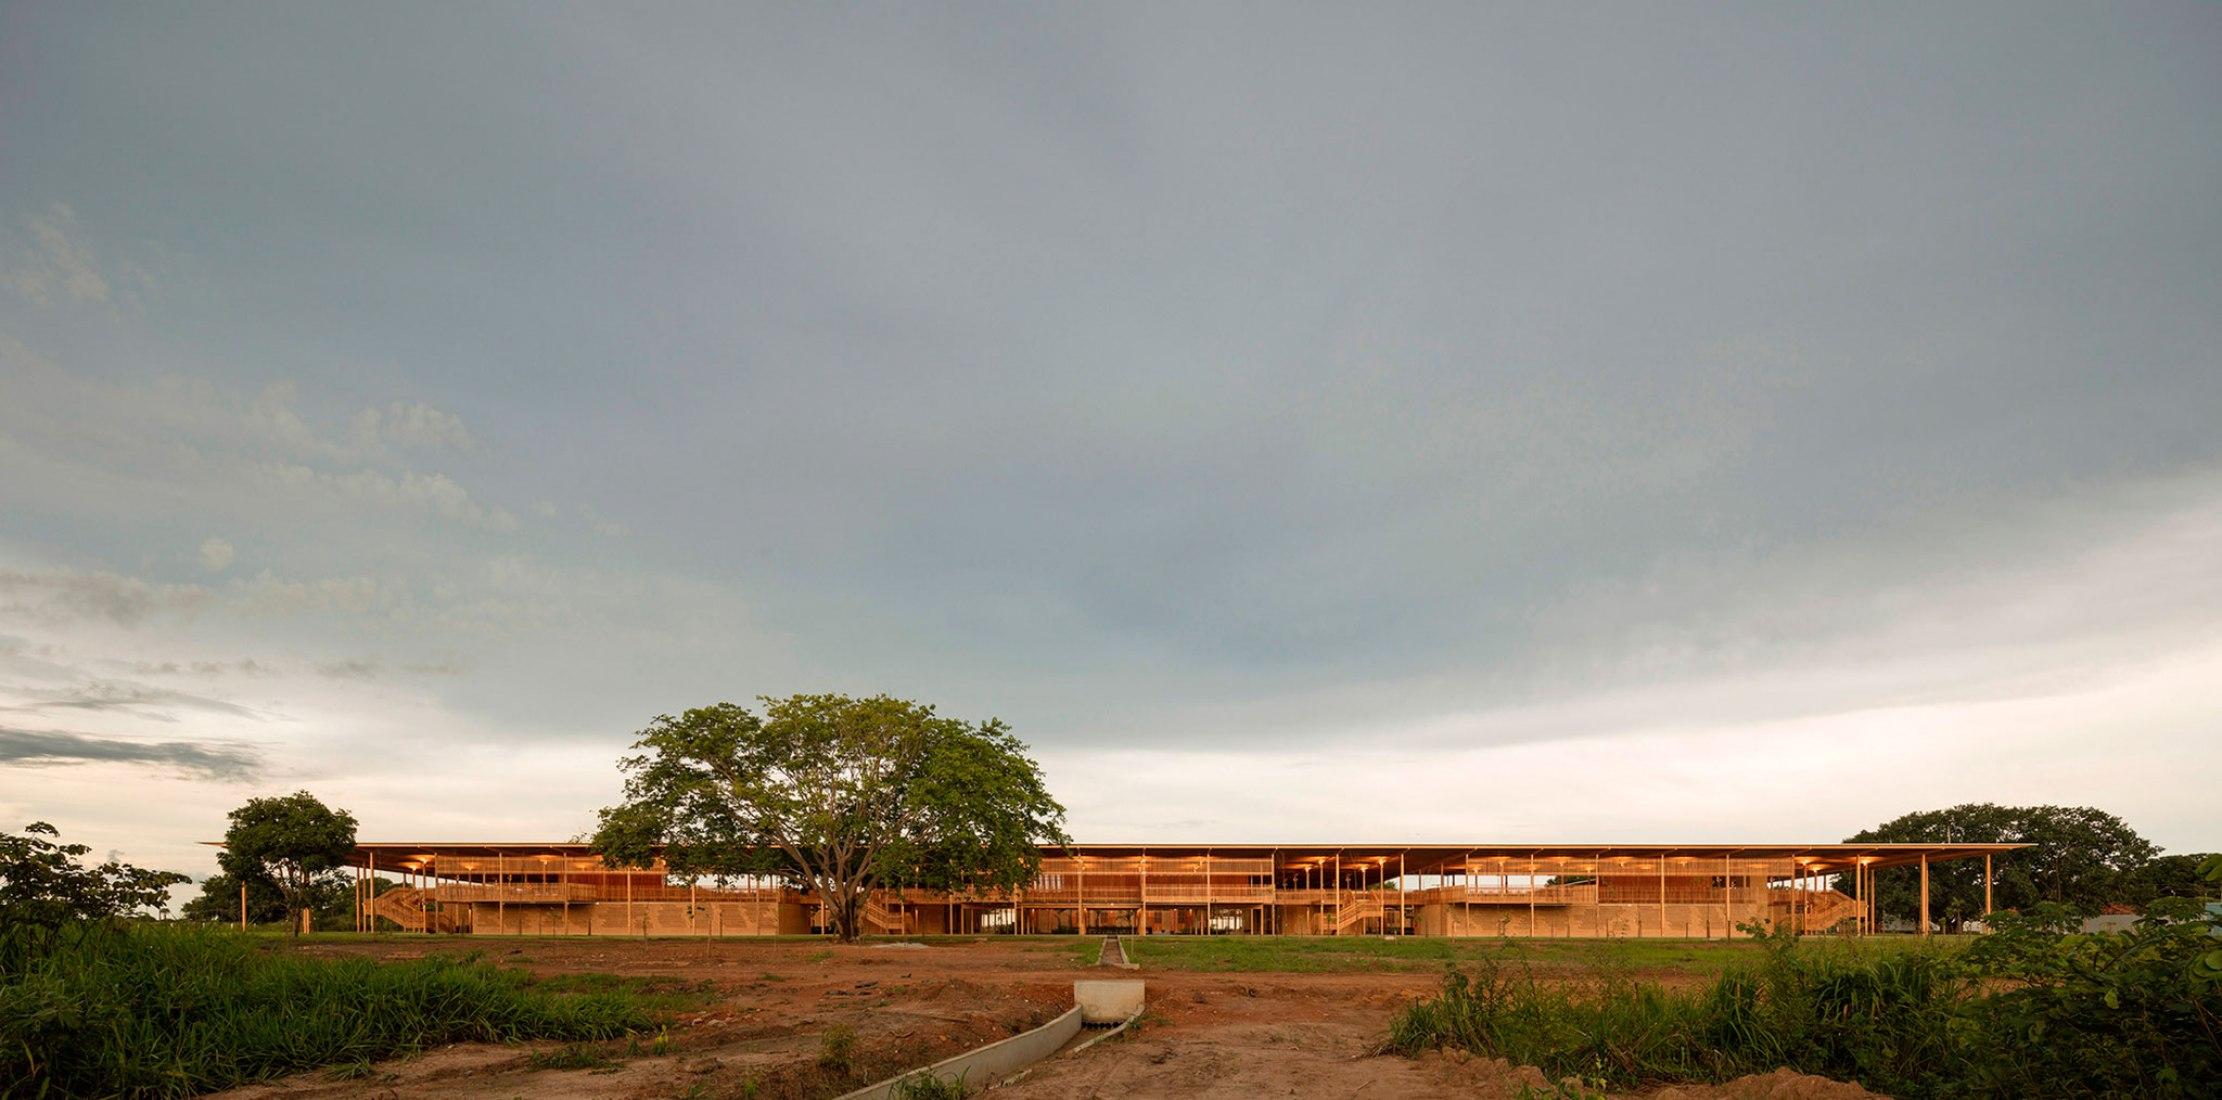 Children Village en Formoso do Araguaia, Tocantins, Brasil por Aleph Zero + Rosenbaum. Fotografía de Leonardo Finotti.